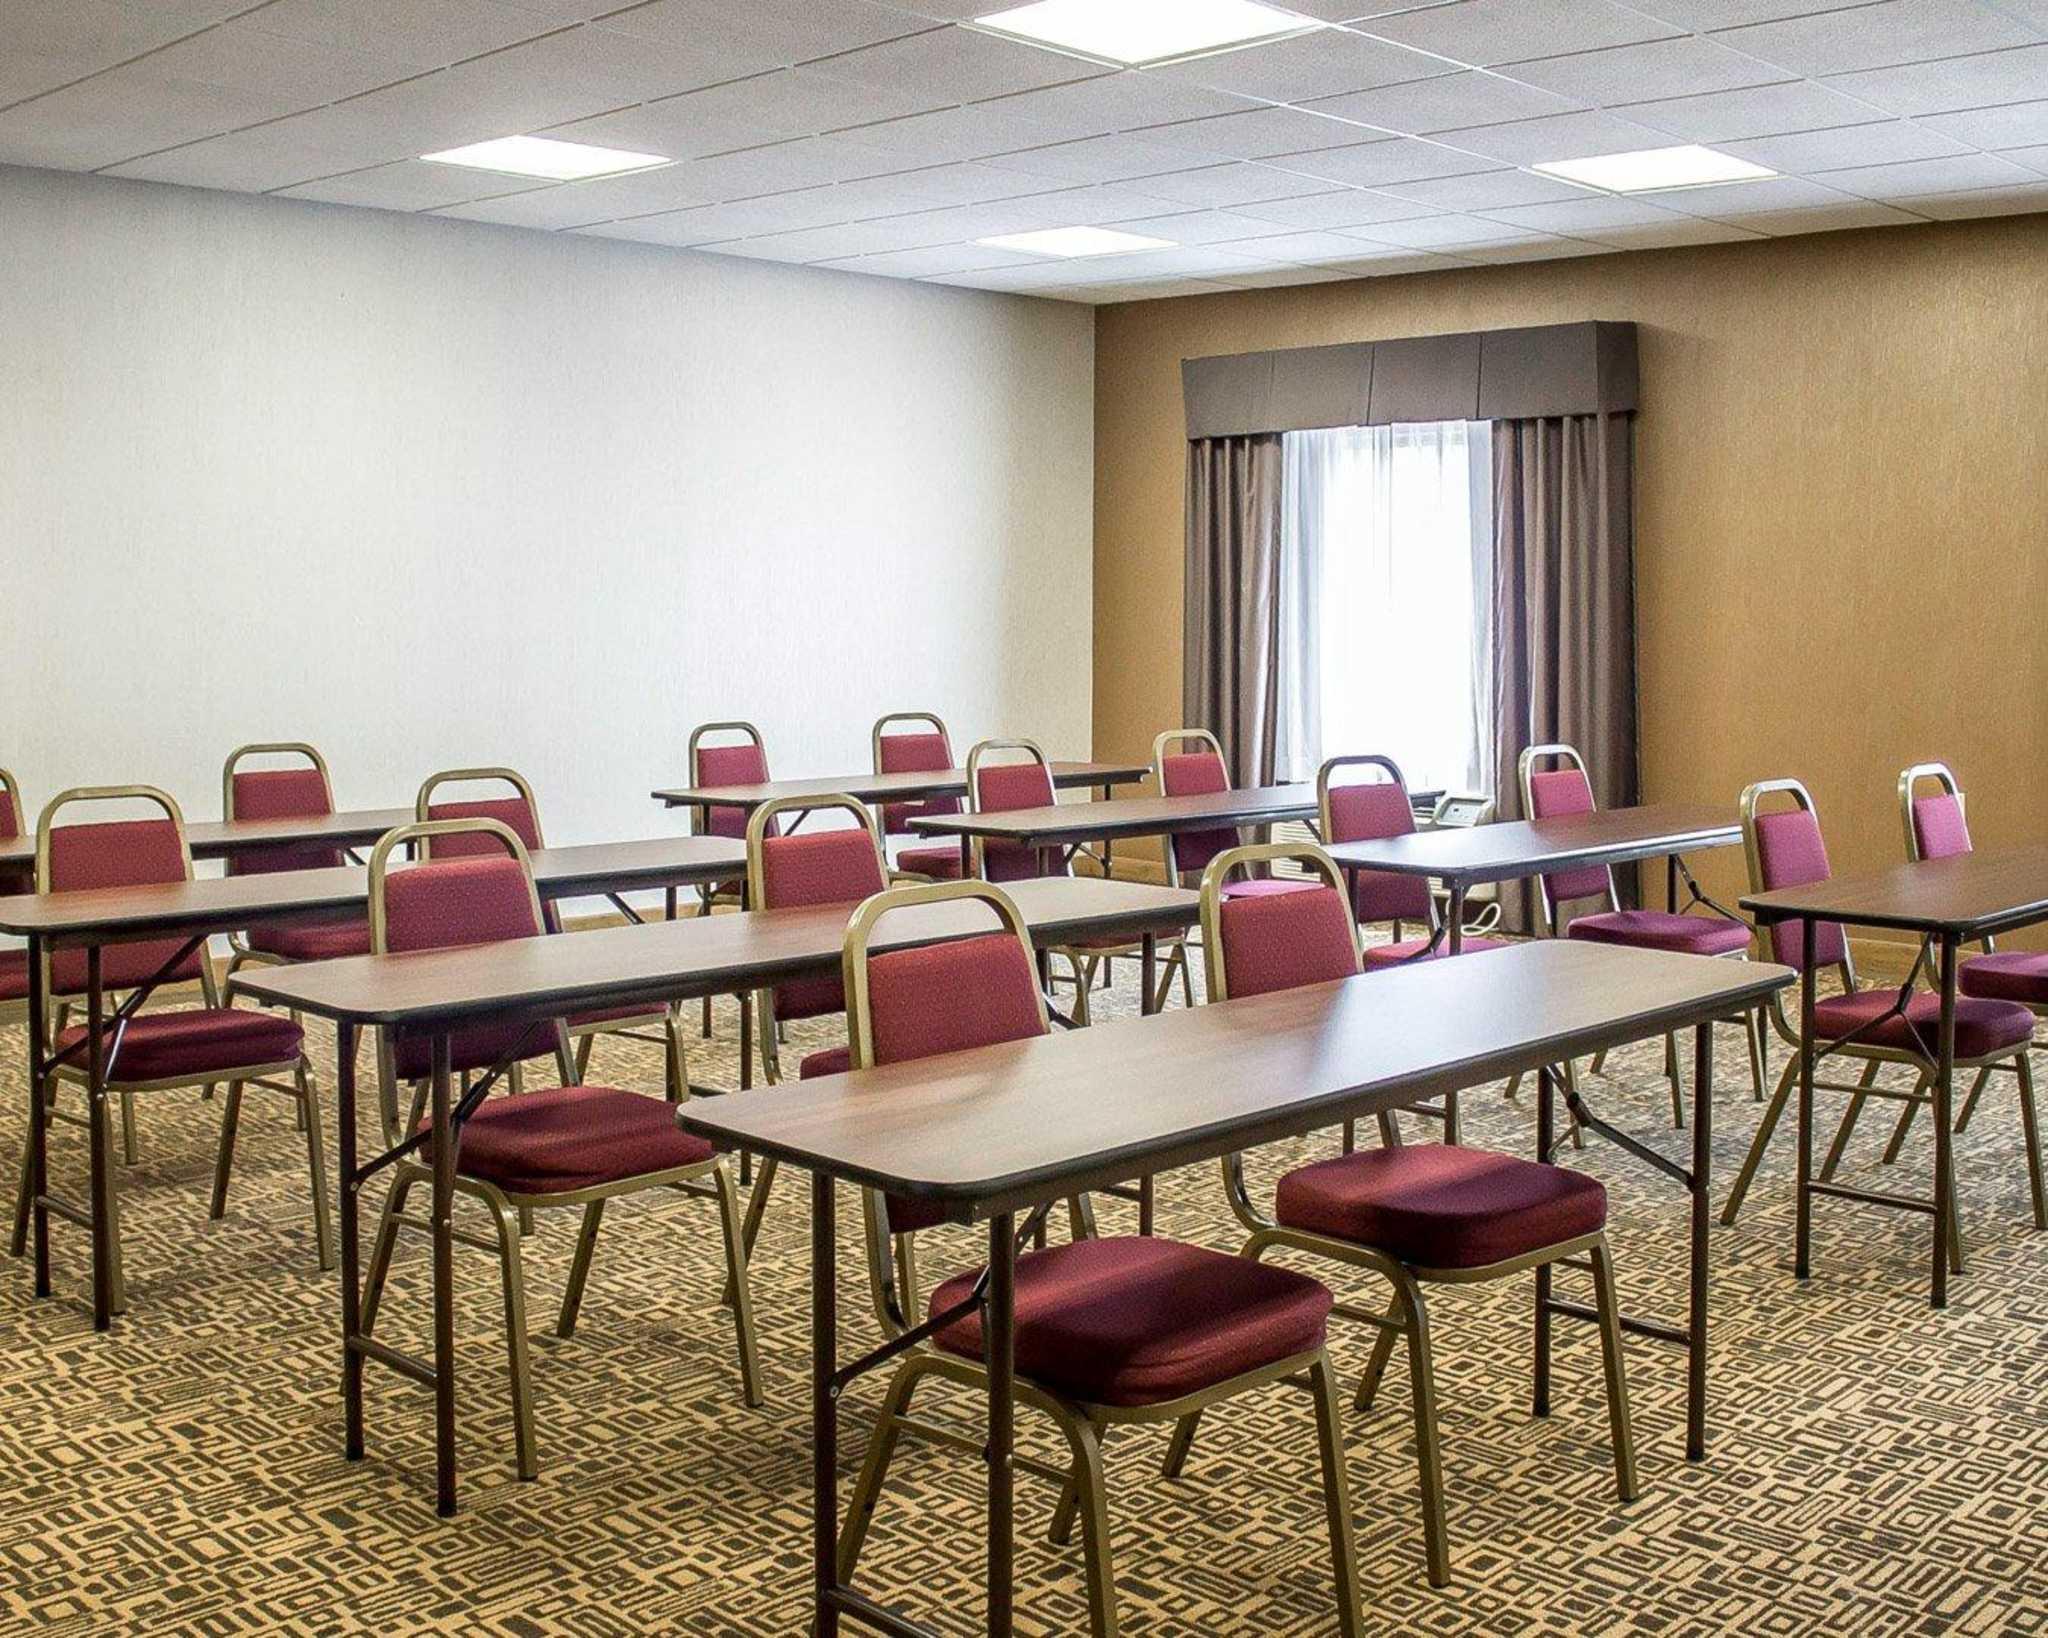 Comfort Suites Perrysburg - Toledo South image 12